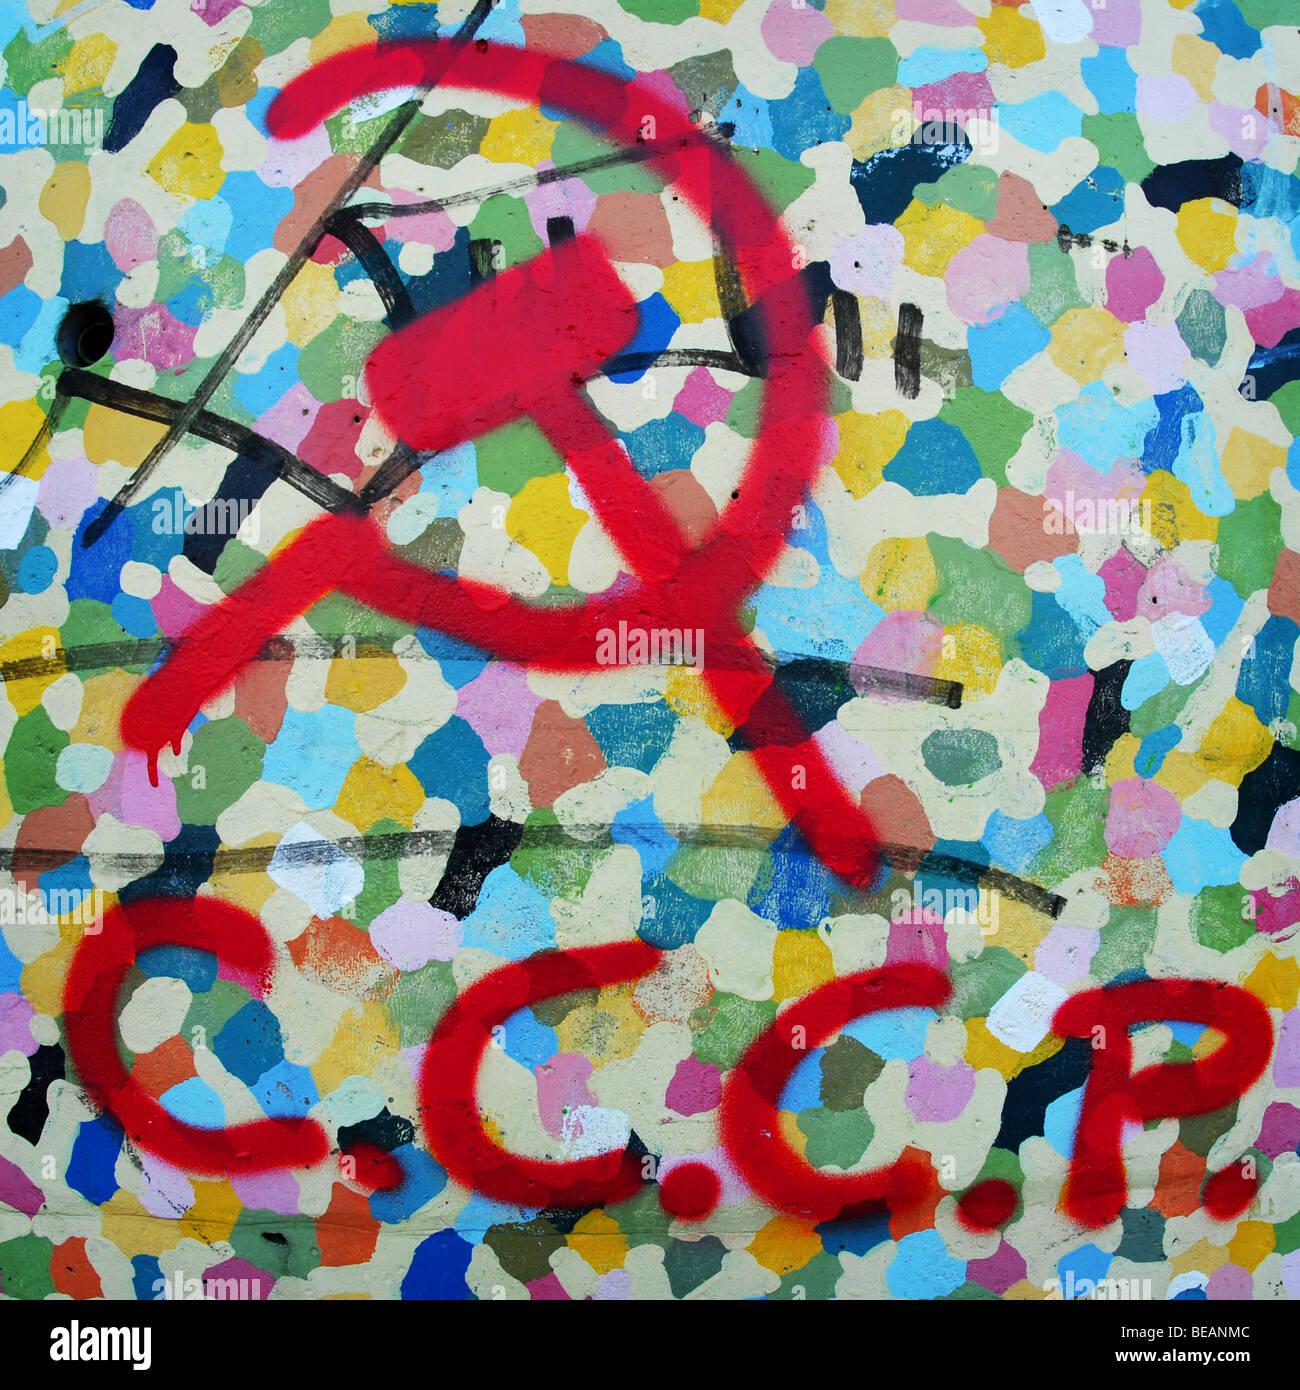 Union of Soviet Socialist Republics - Stock Image